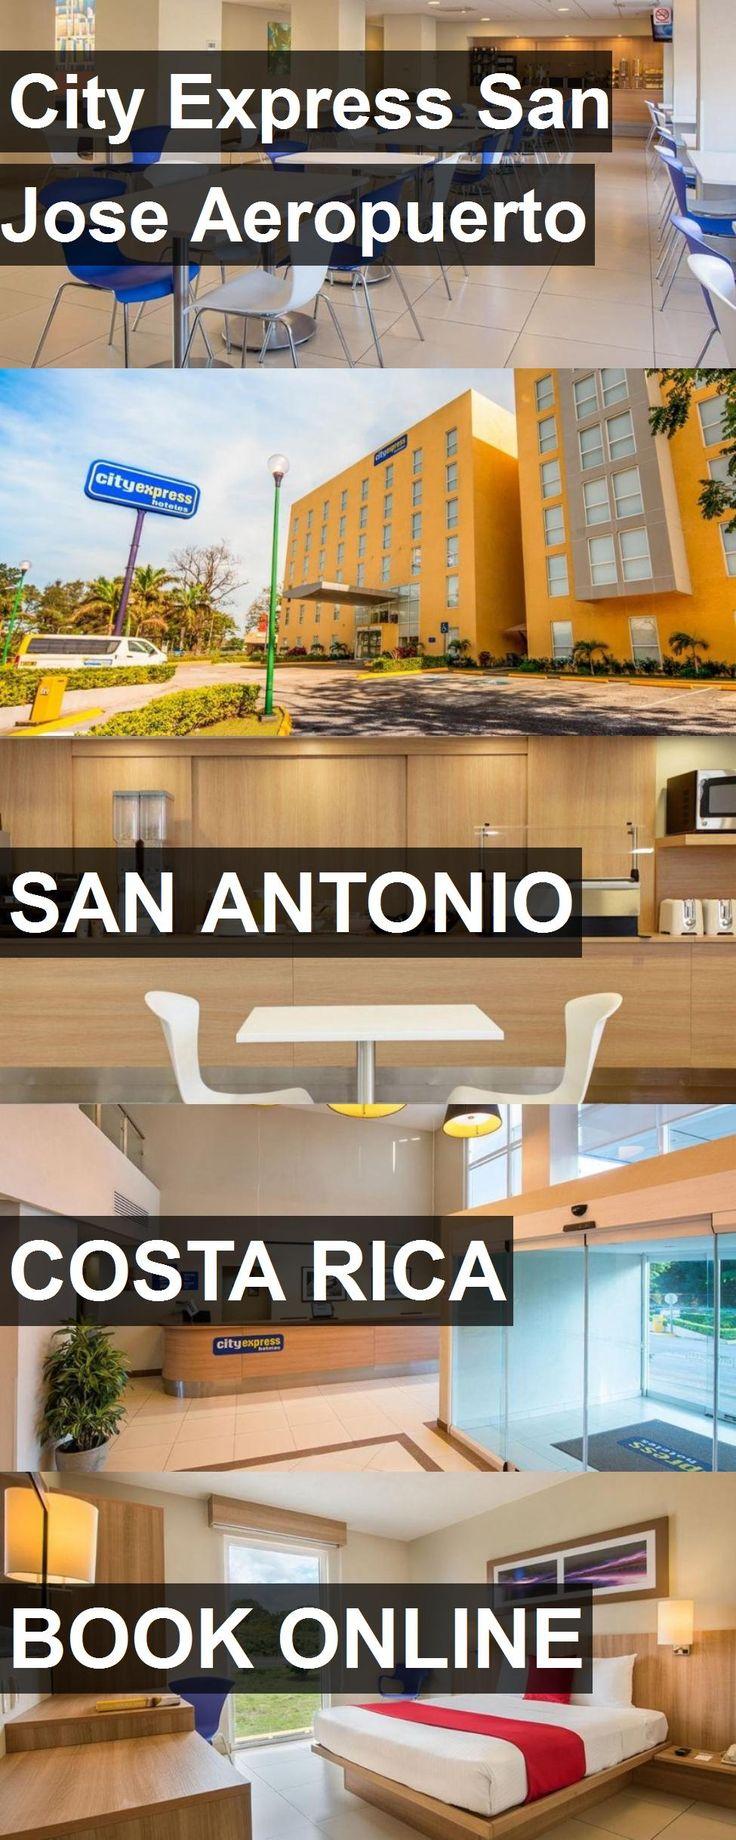 Hotel City Express San Jose Aeropuerto in San Antonio, Costa Rica. For more information, photos, reviews and best prices please follow the link. #CostaRica #SanAntonio #travel #vacation #hotel